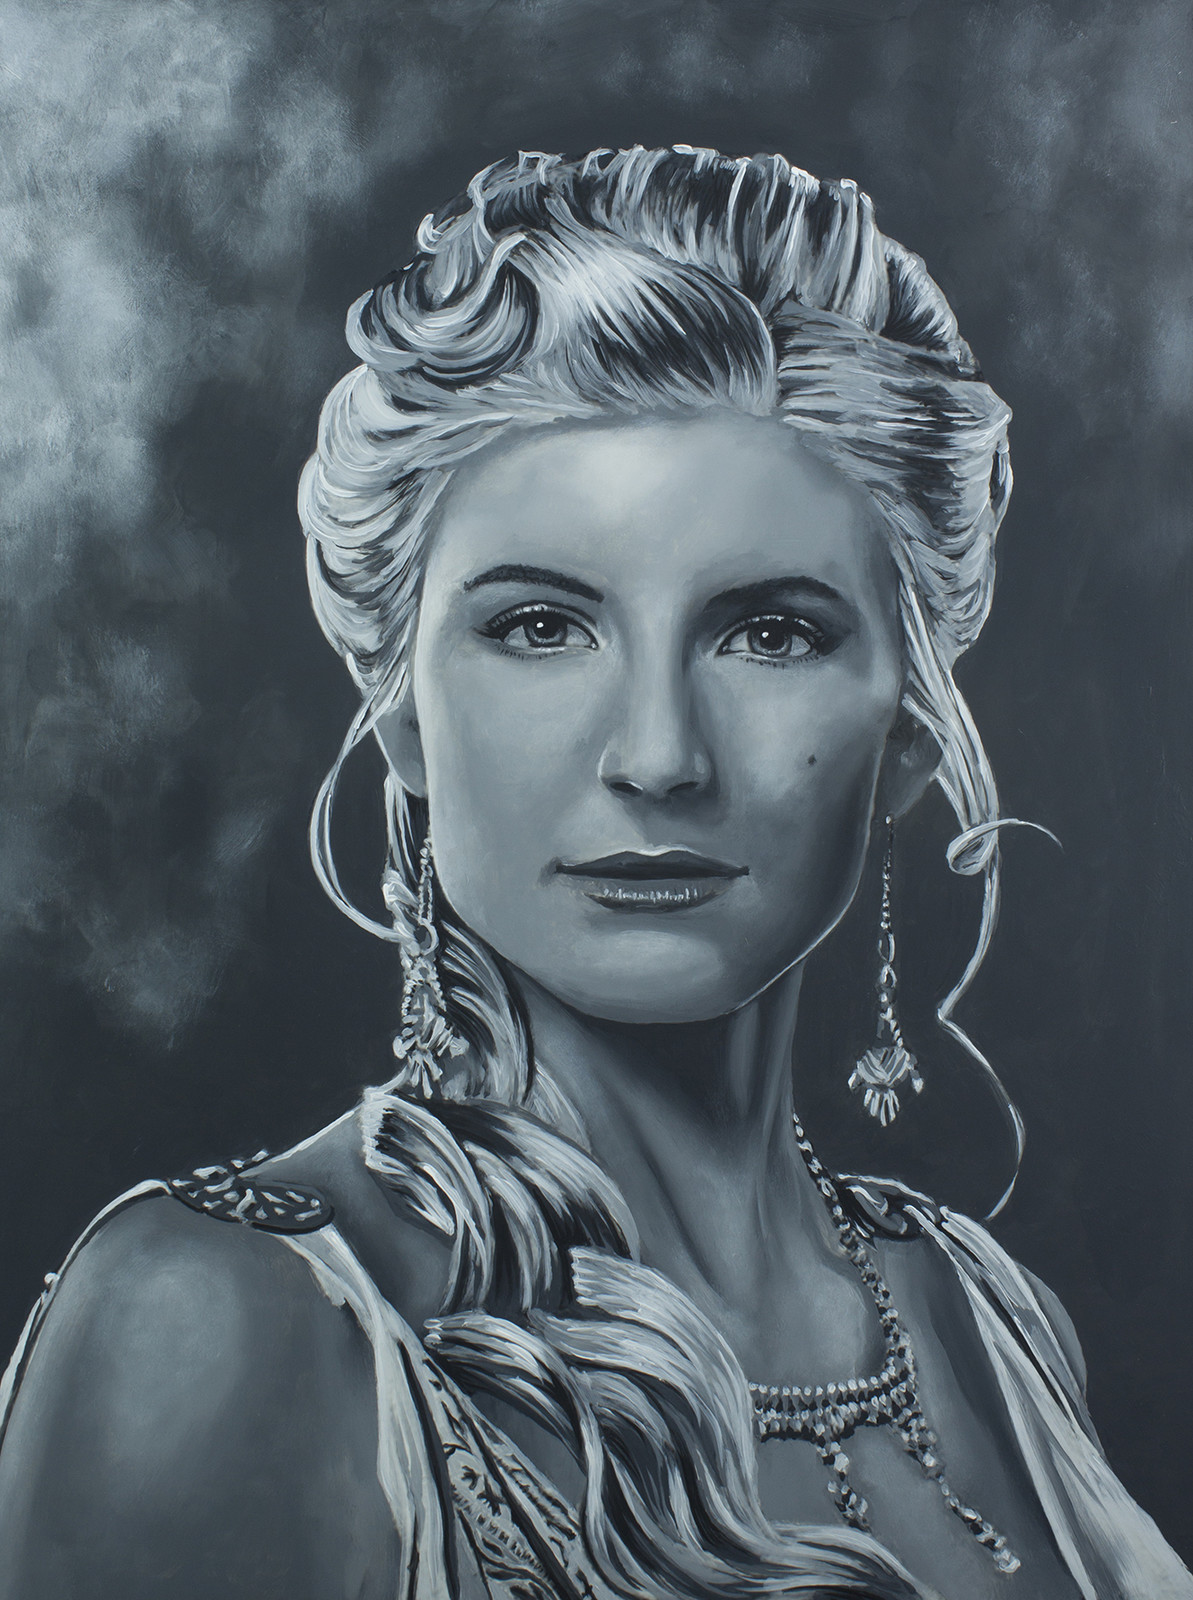 Ilythia - Viva Bianca Spartacus Series - Acrylic on board. 16x20